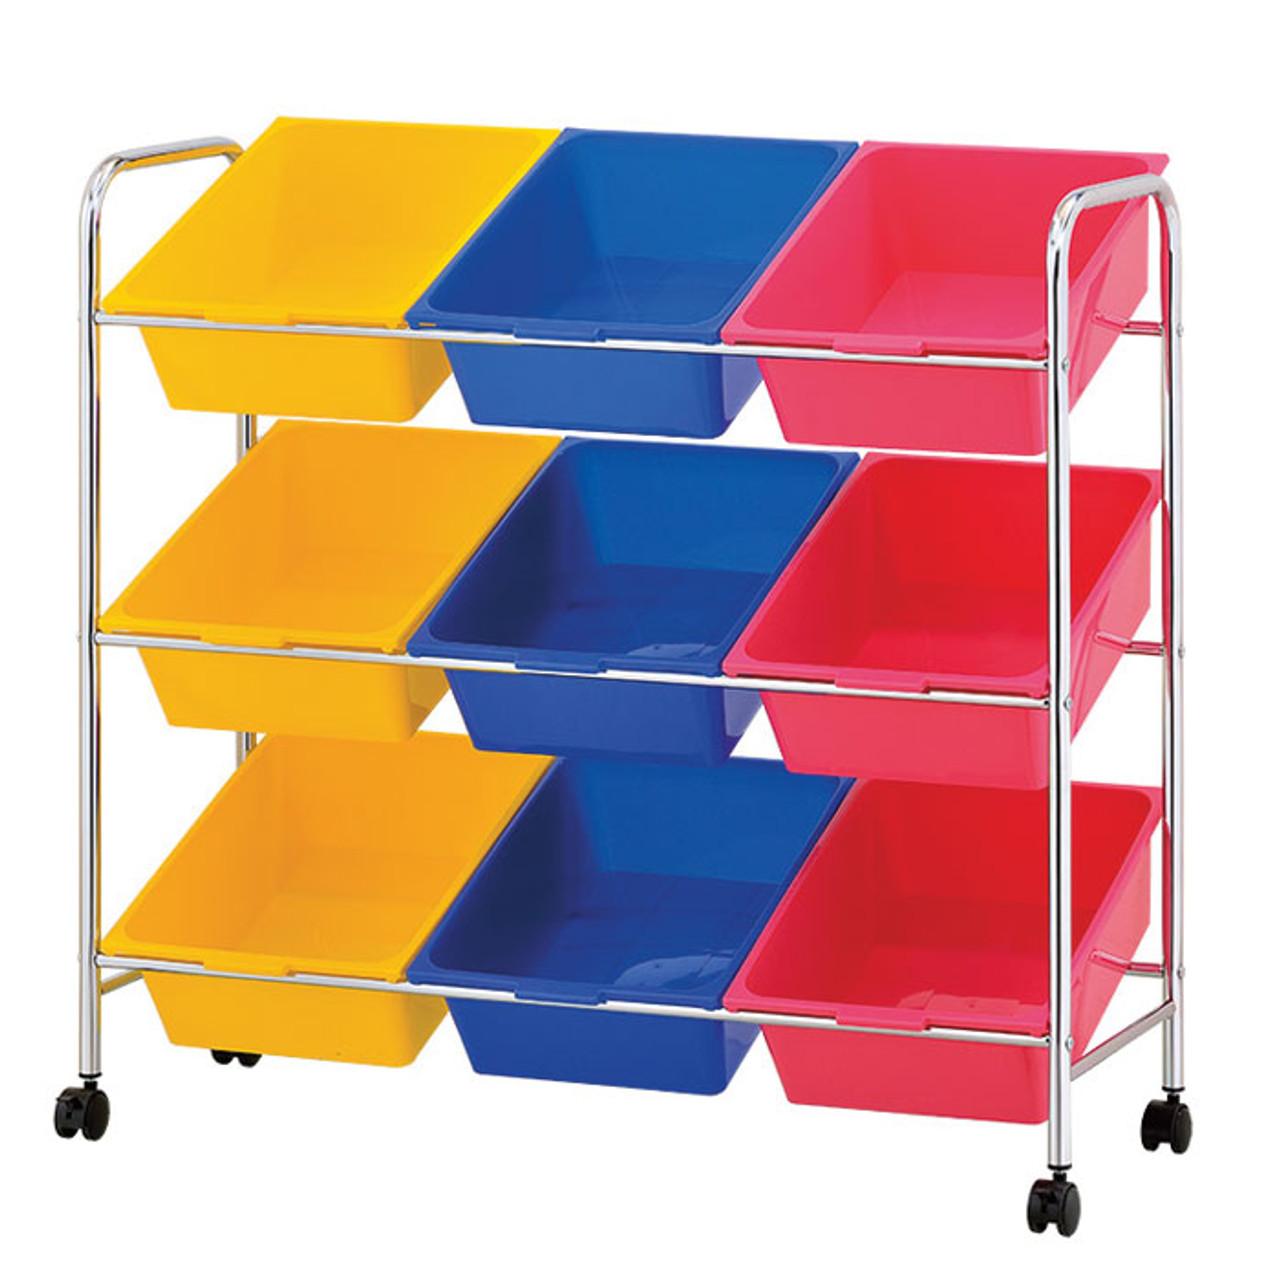 plastic storage drawers. 9 Plastic Drawer Storage Cart | Drawers Rolling M